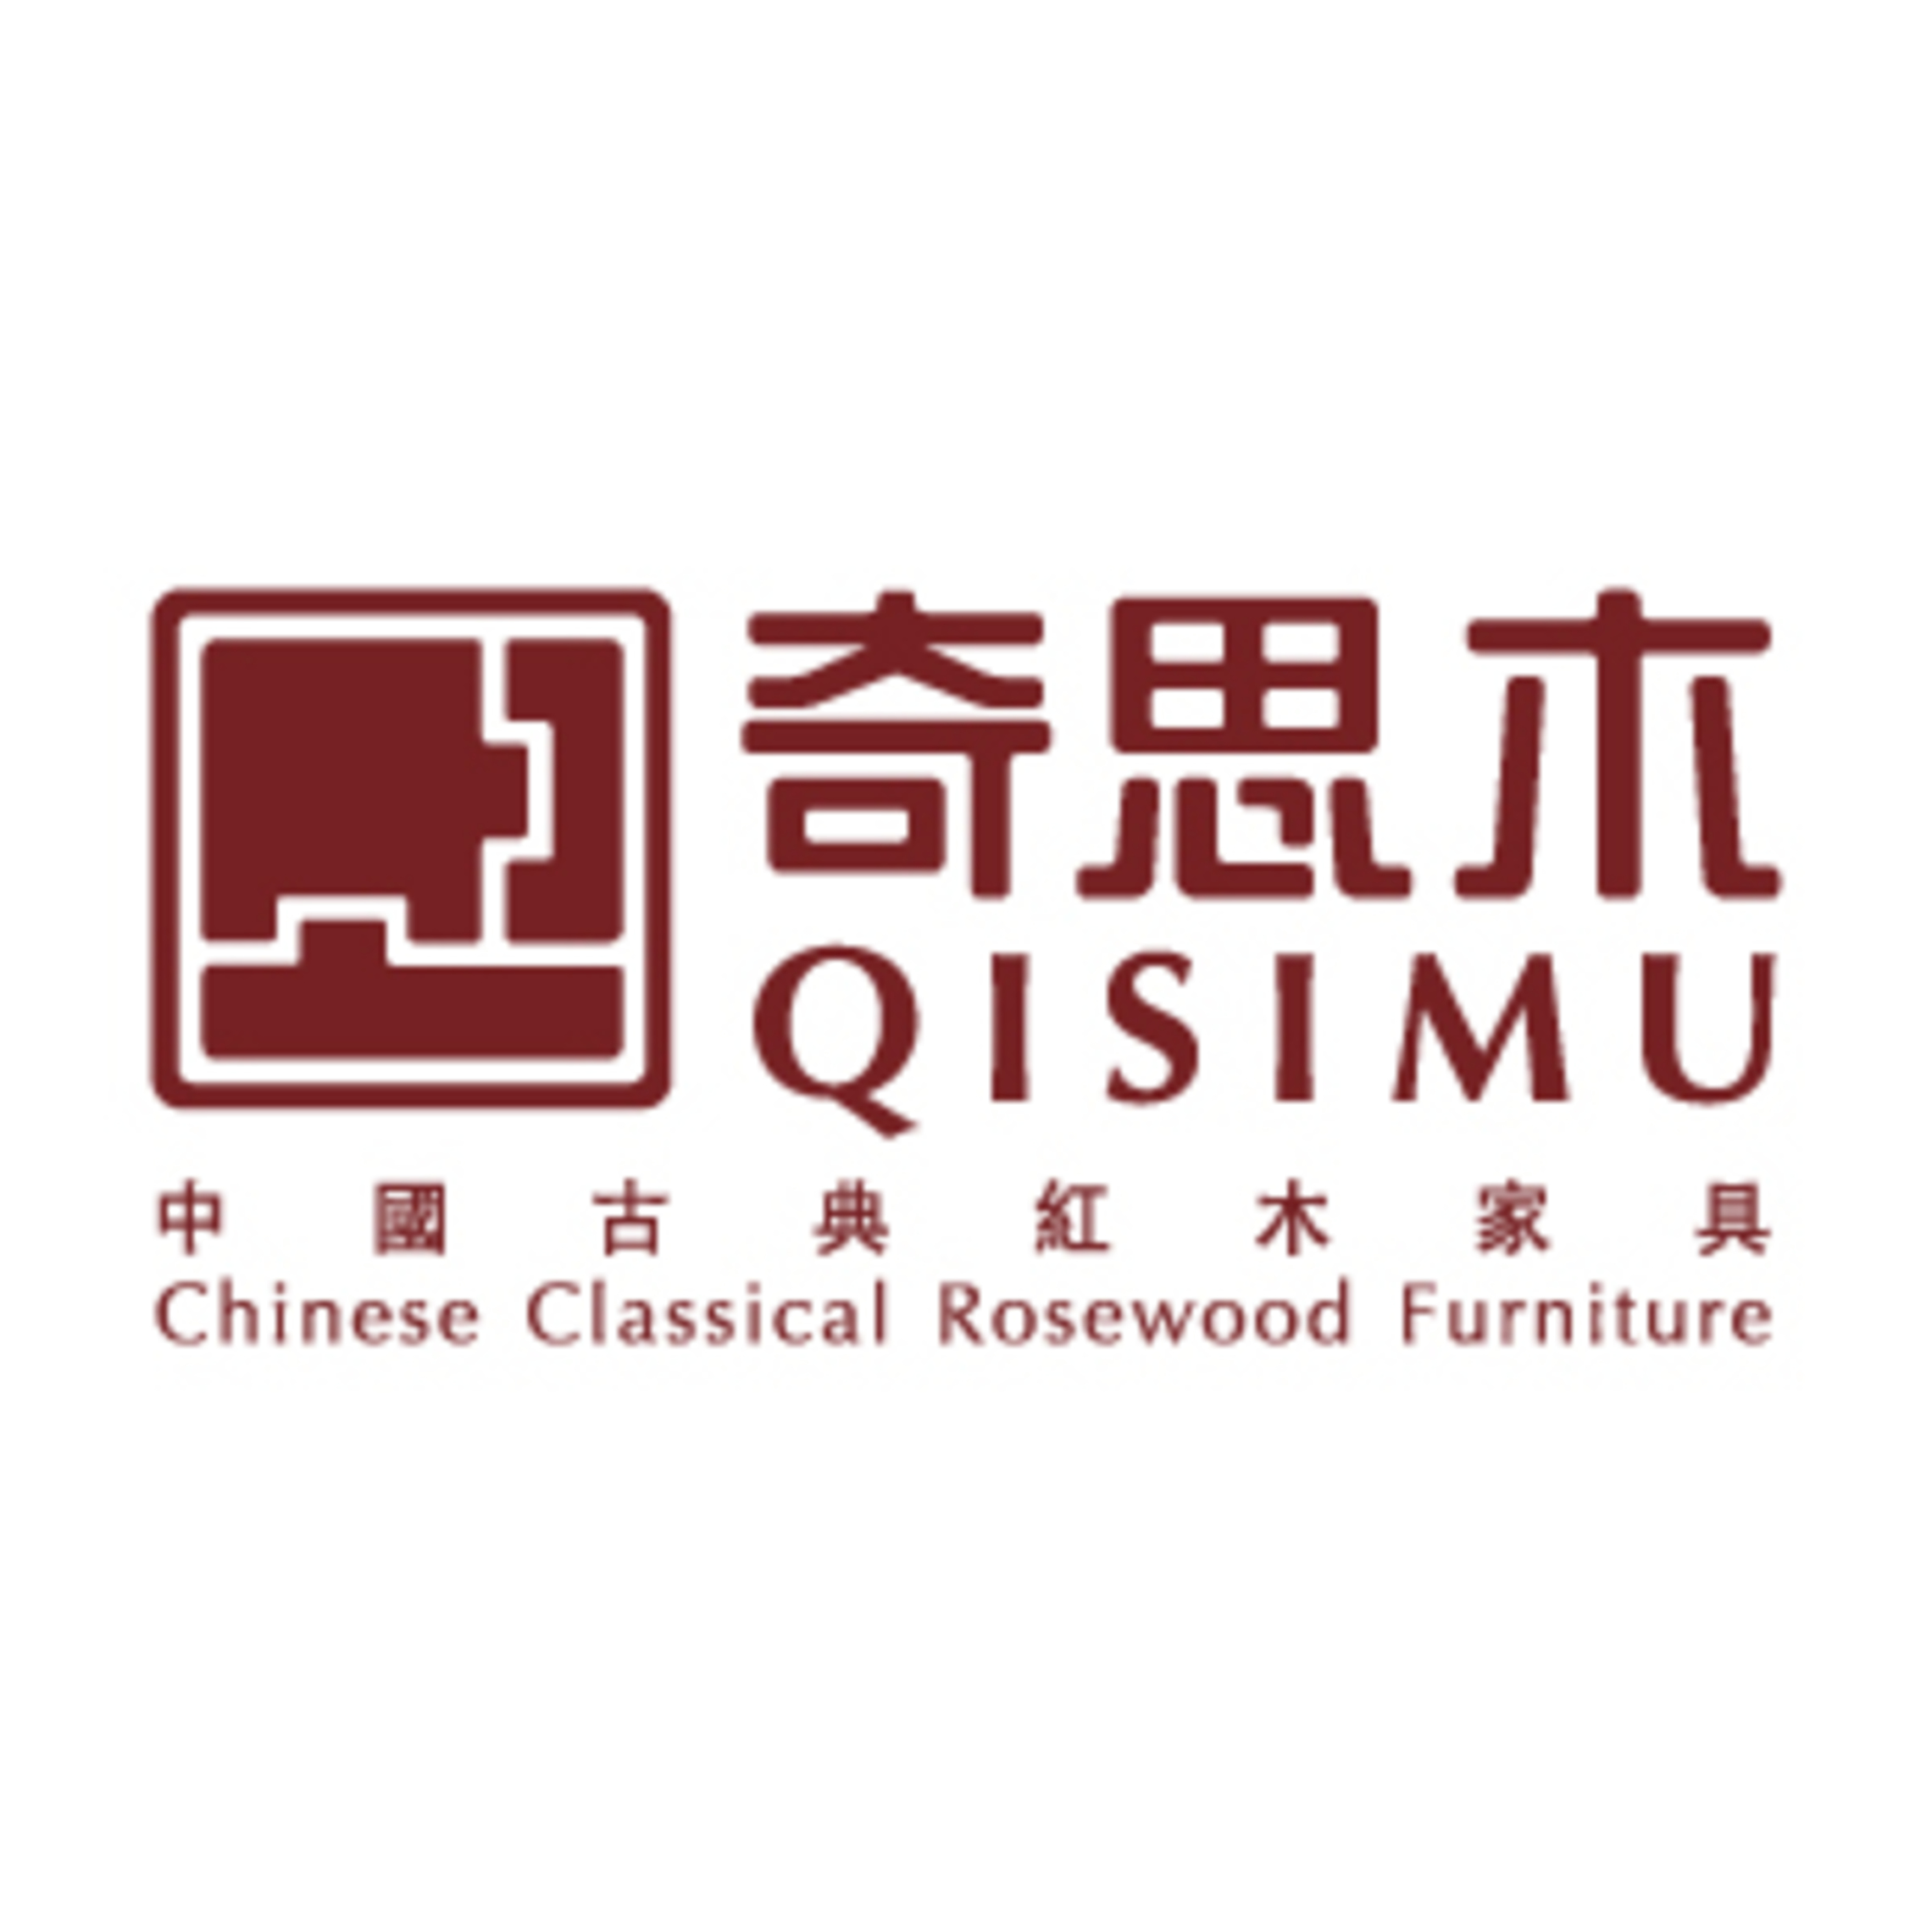 qisimu- company logo